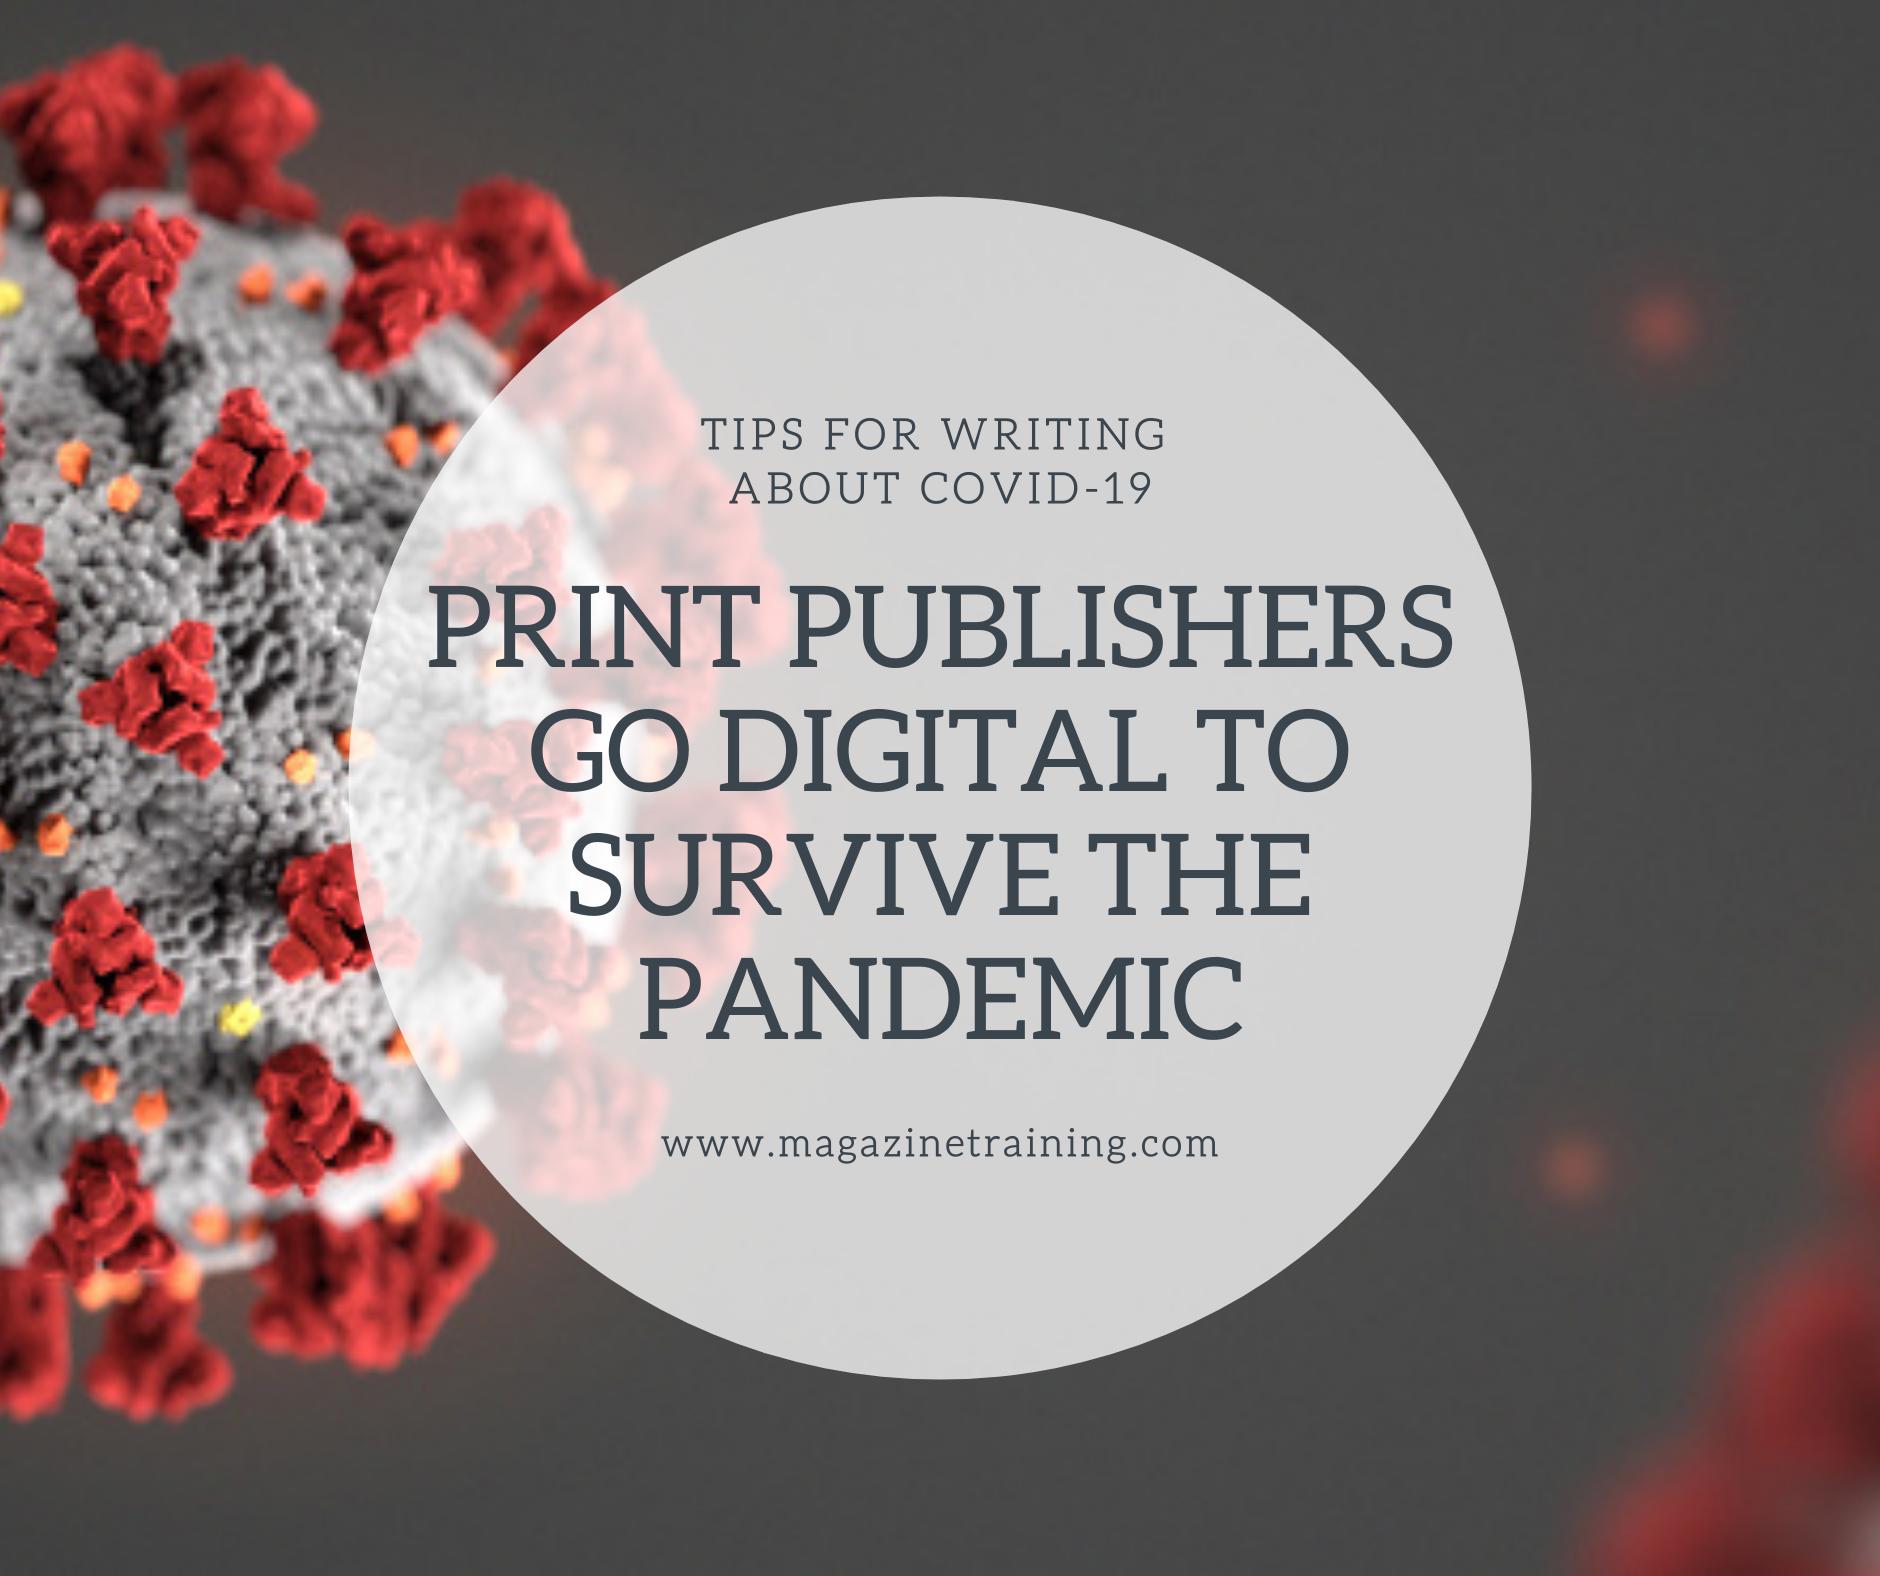 print publishers go digital